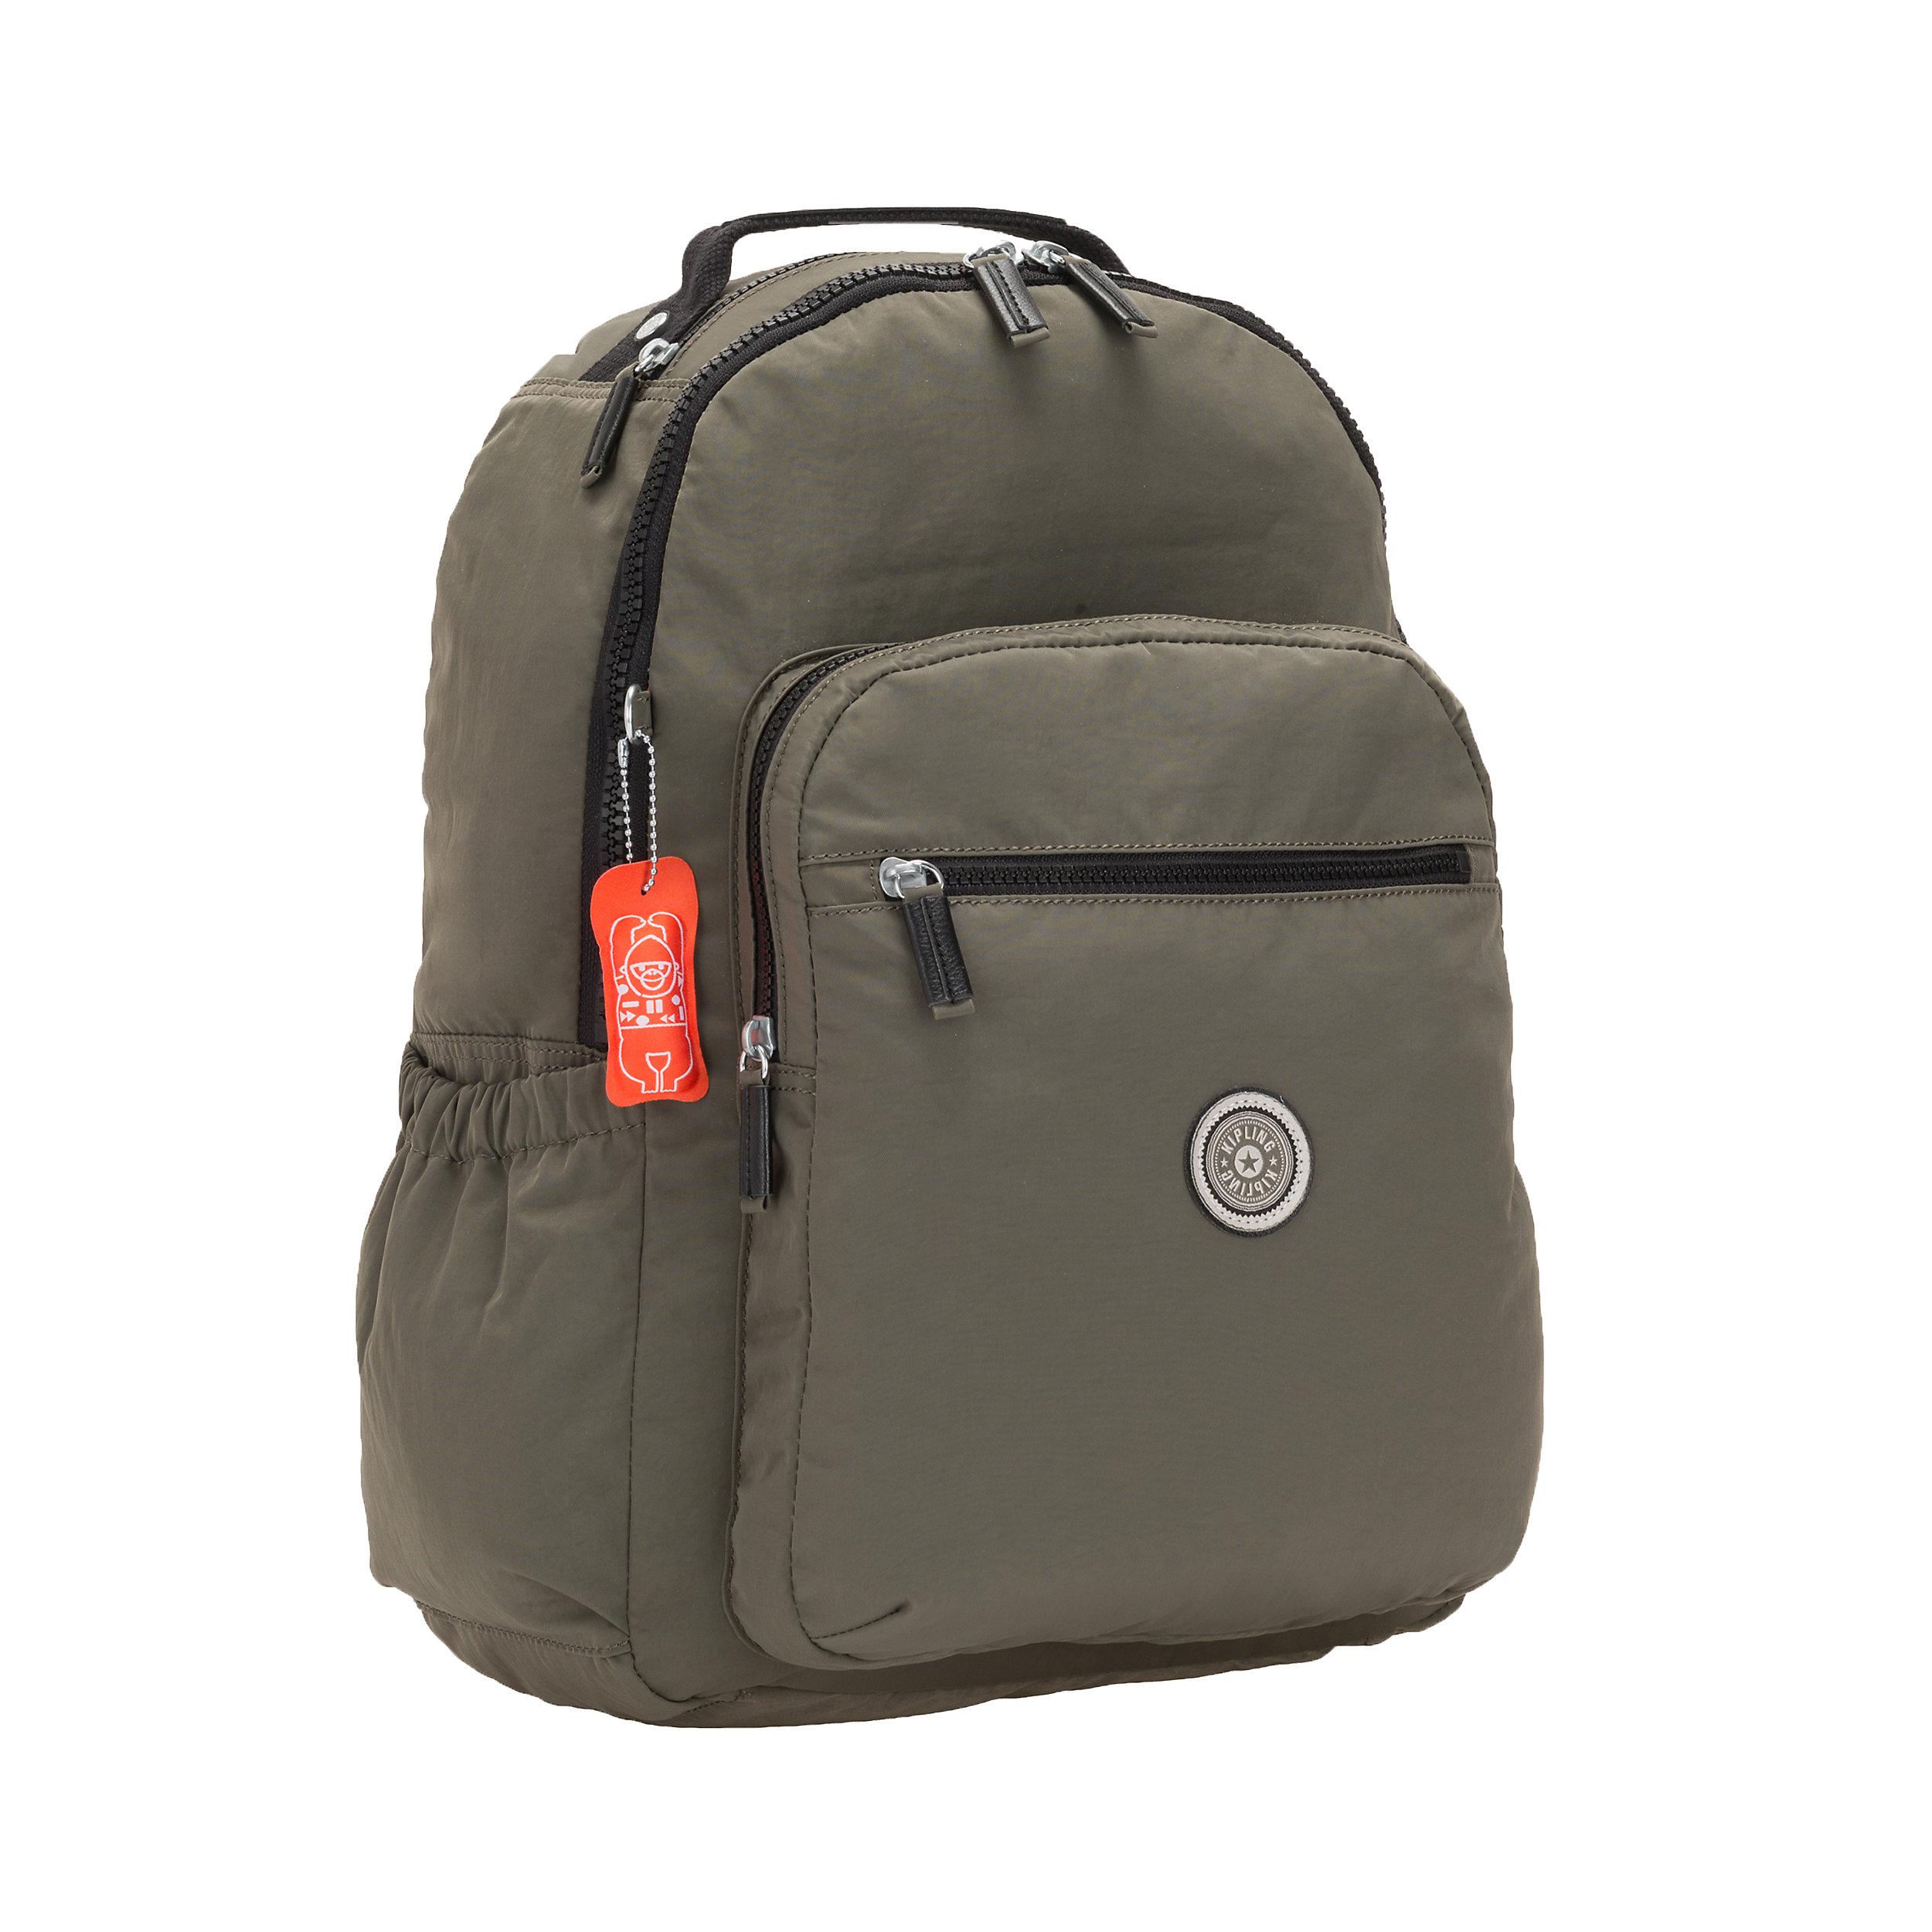 "School Backpack Seoul Go 15"" Boost It 27 Liter"